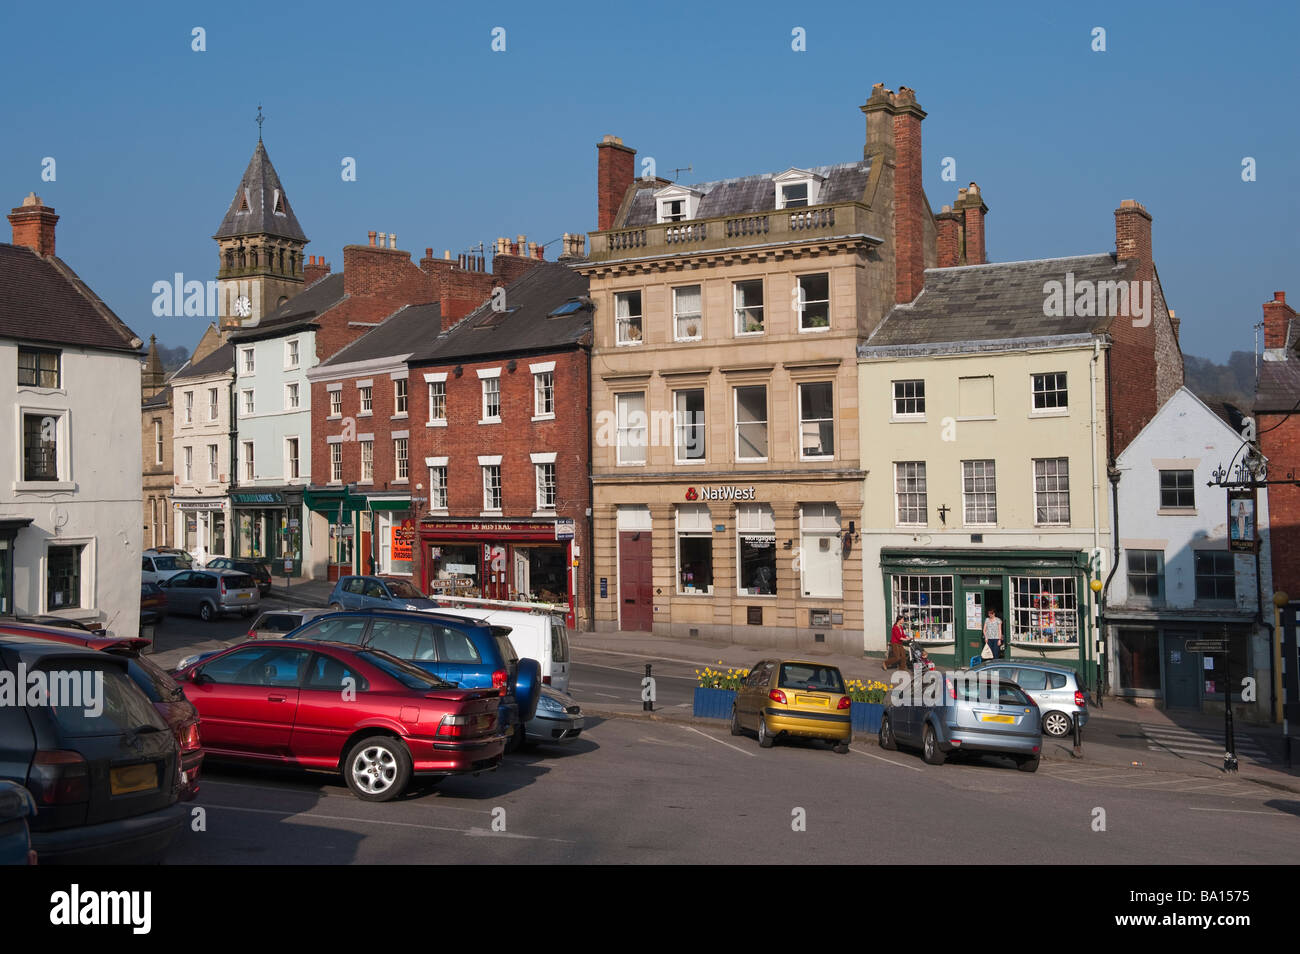 'Market Place' in Wirksworth, Derbyshire,  England, 'Great Britain', 'United Kingdom' - Stock Image